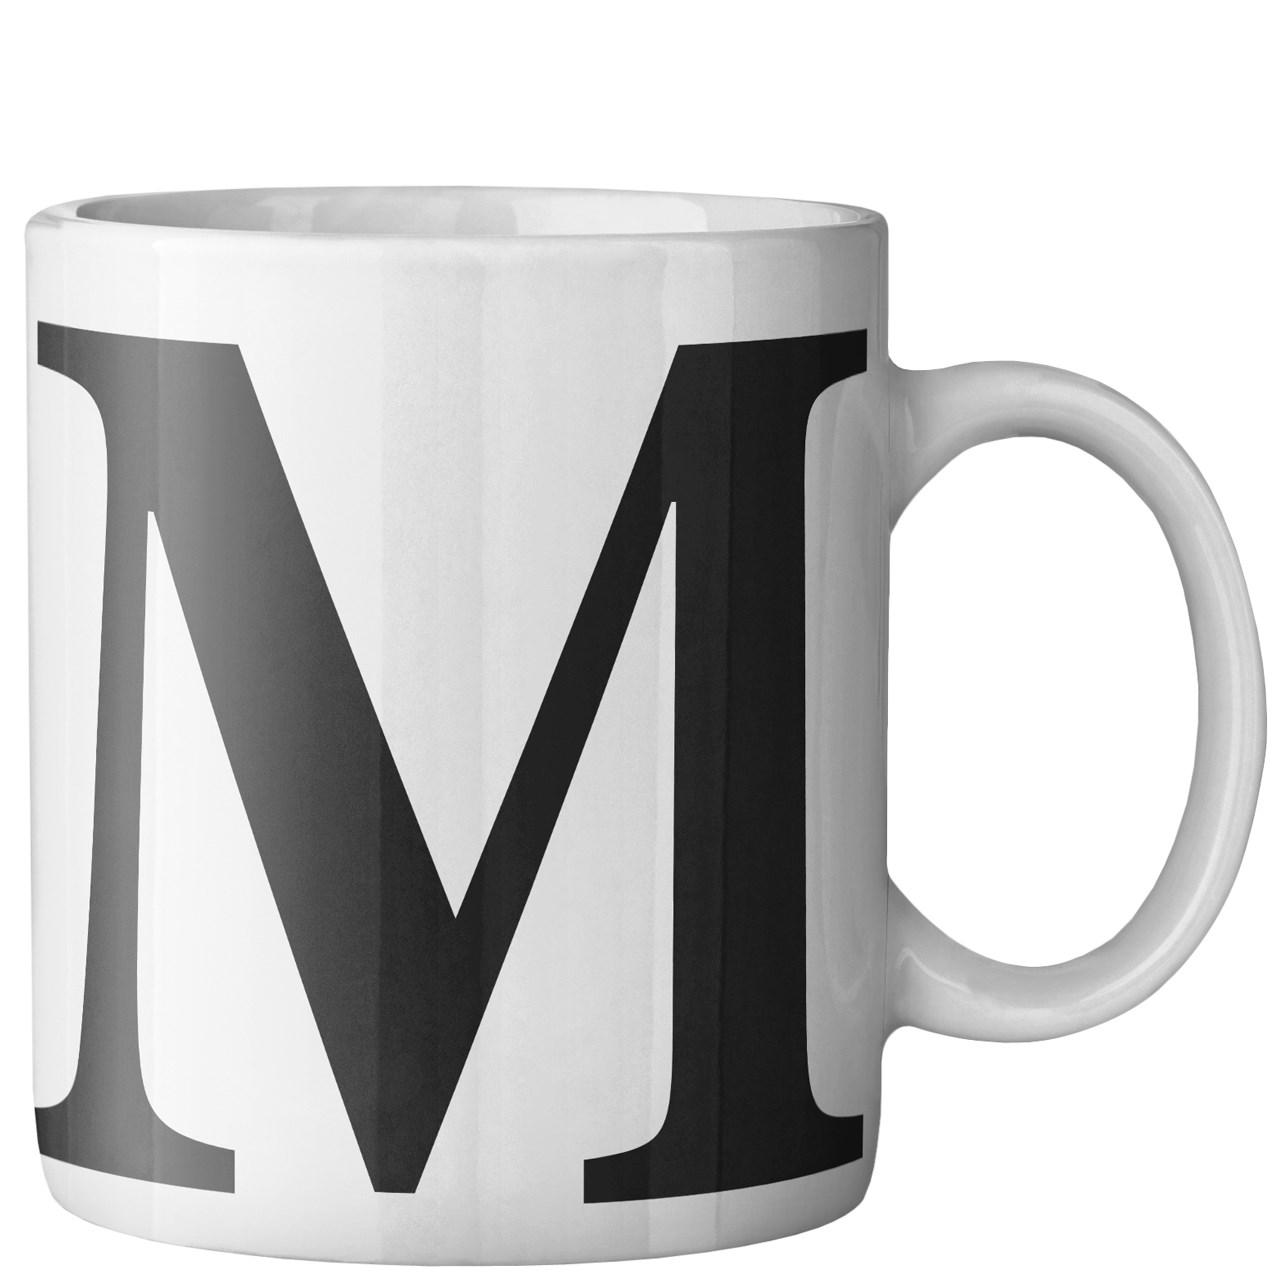 عکس ماگ ماگستان مدل M